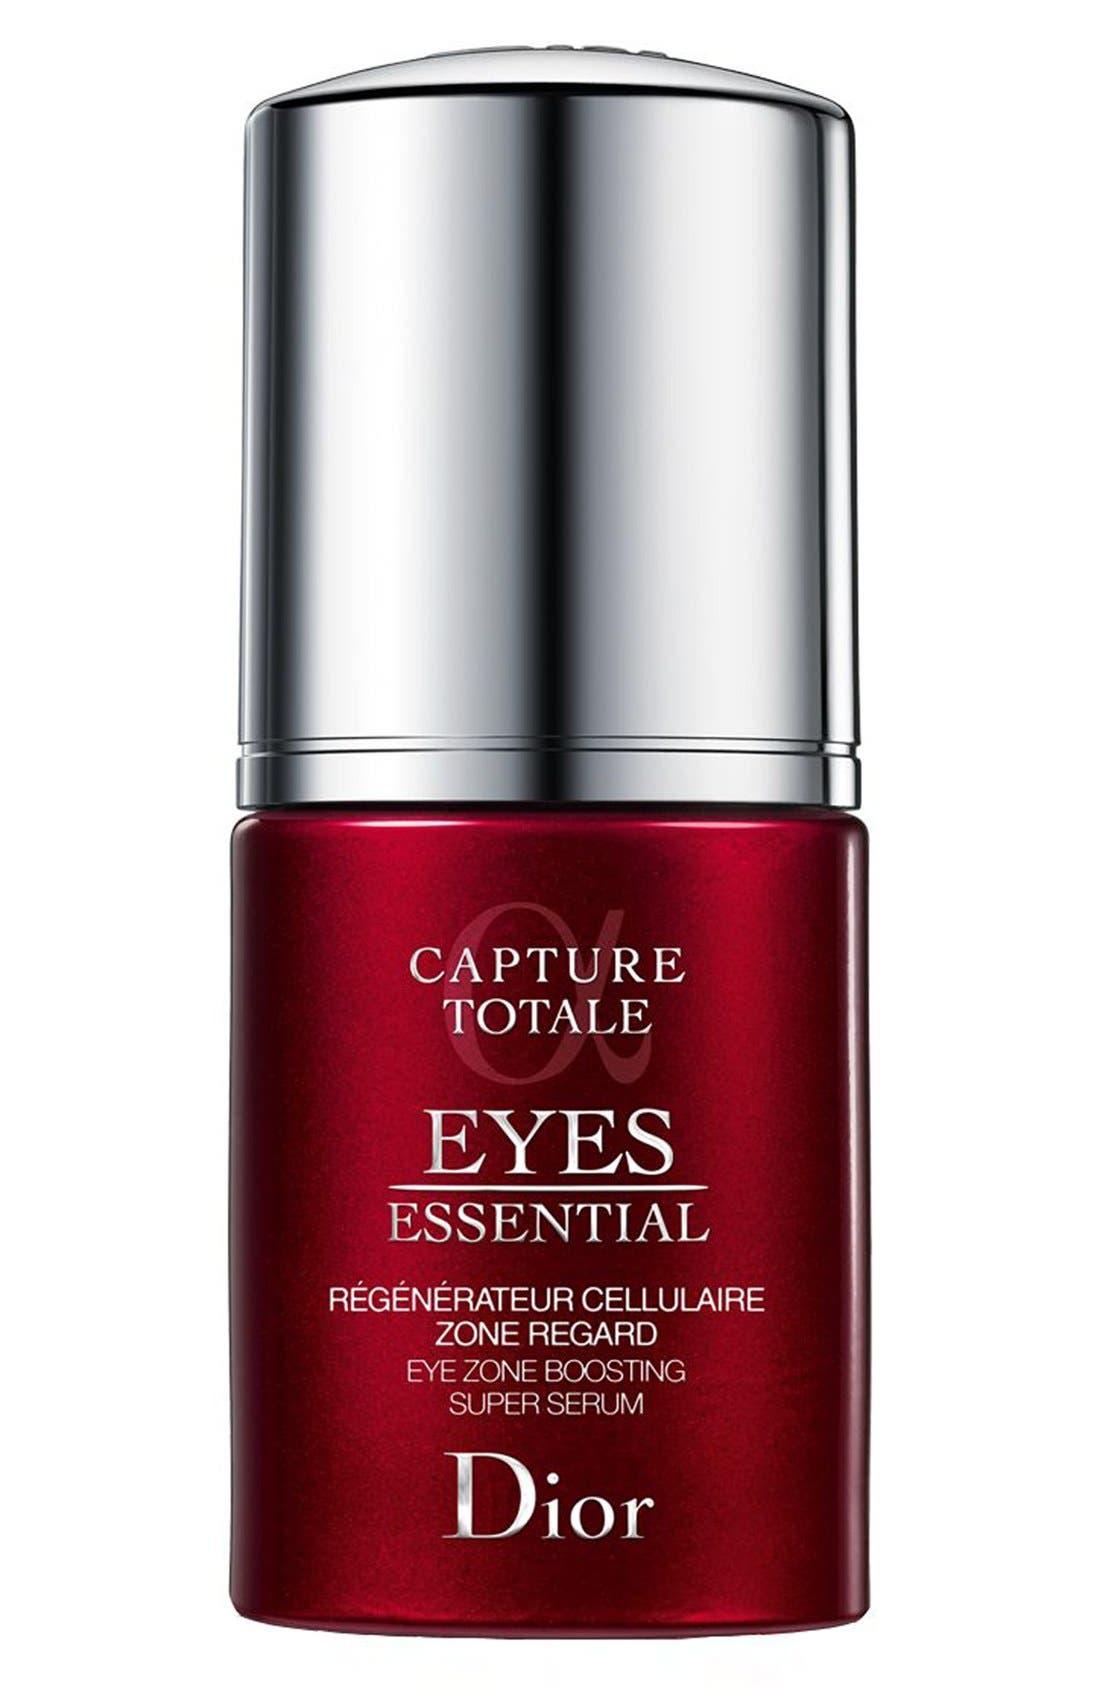 'Capture Totale Eyes Essential' Eye Zone Boosting Super Serum,                             Main thumbnail 1, color,                             000